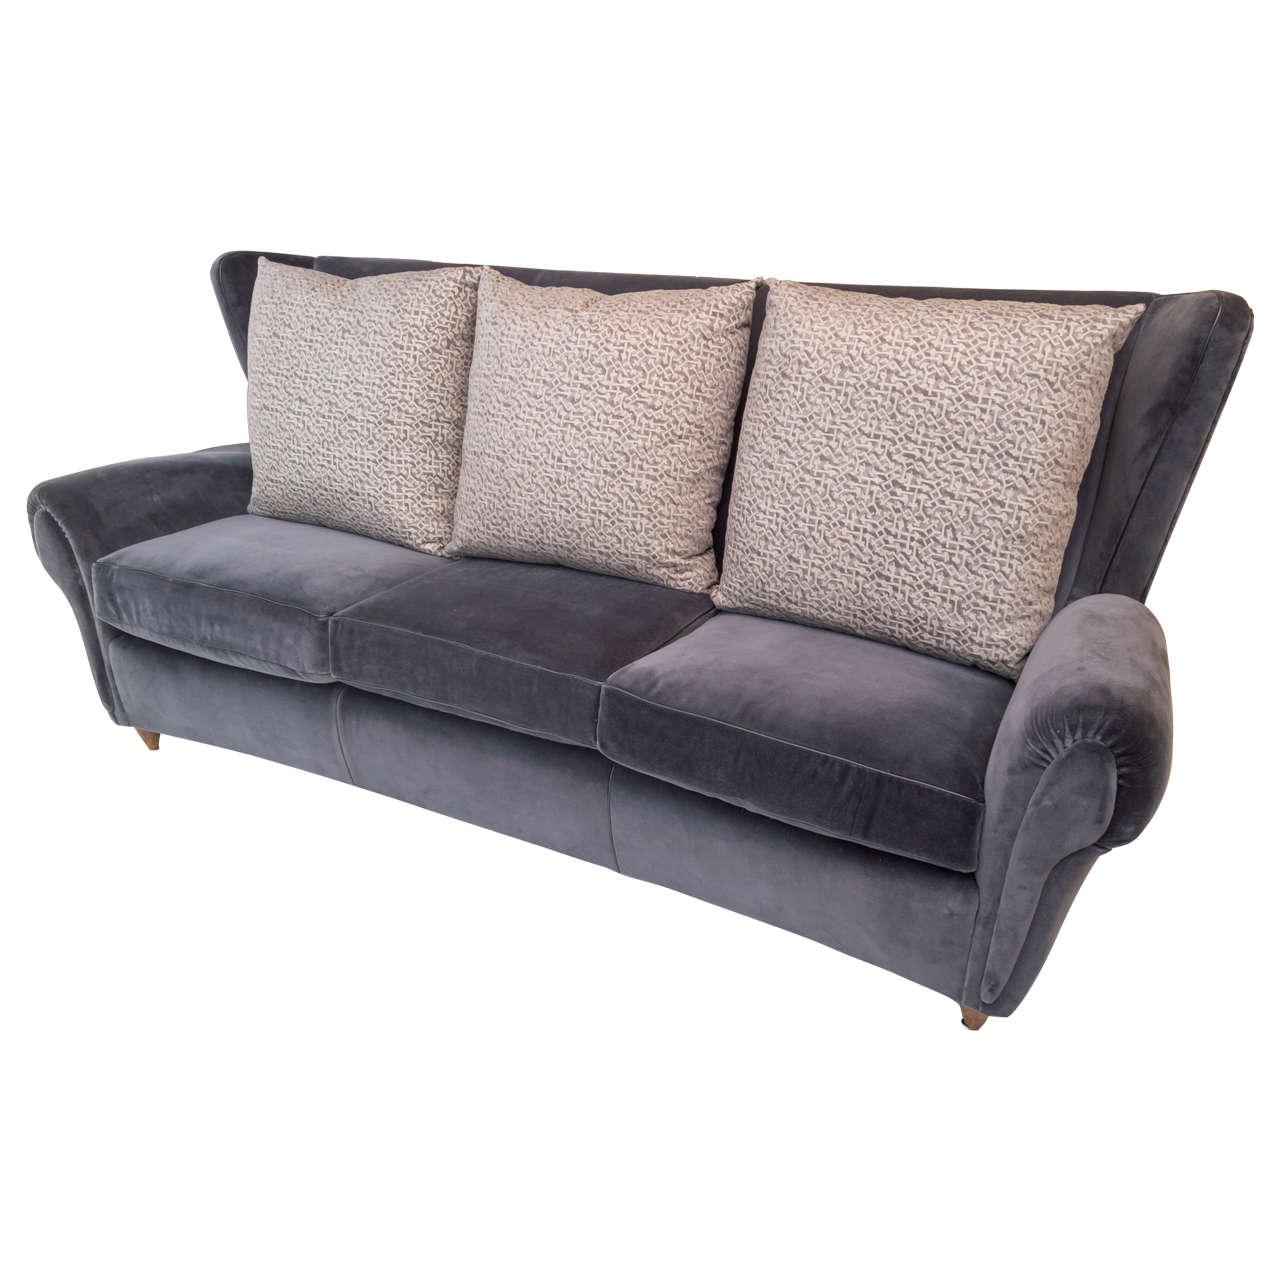 Italian Wingback Sofa For Sale At 1stdibs